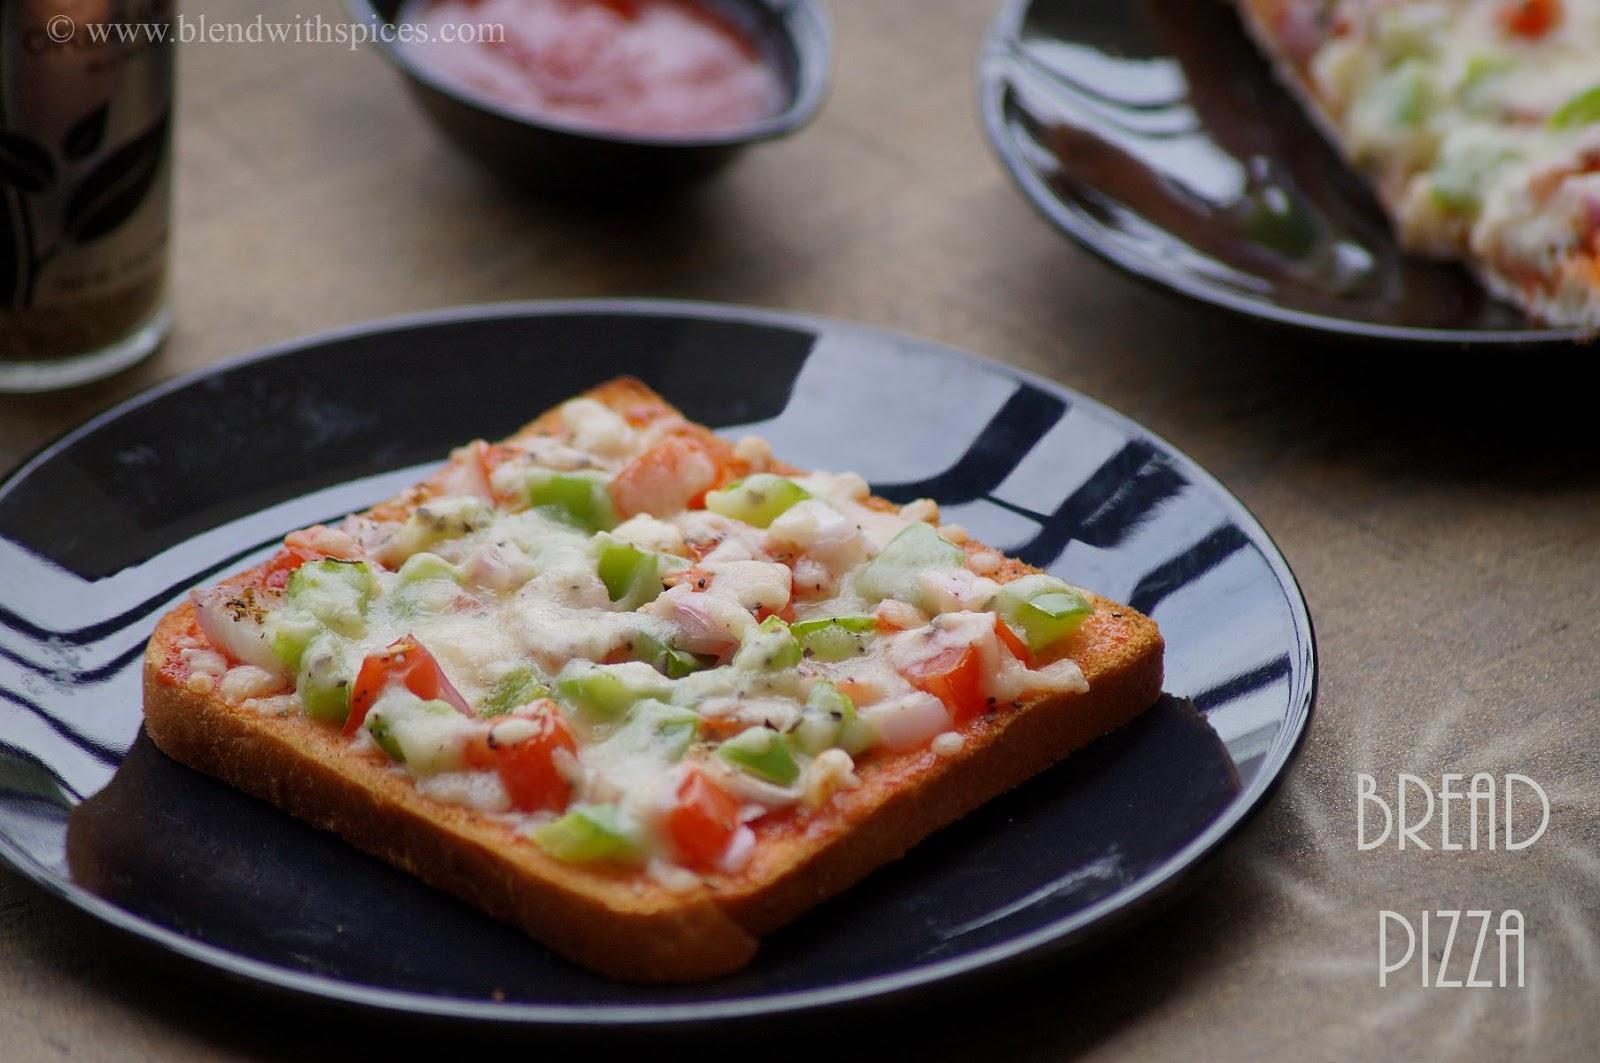 how to make bread pizza, easy bread pizza recipe at home